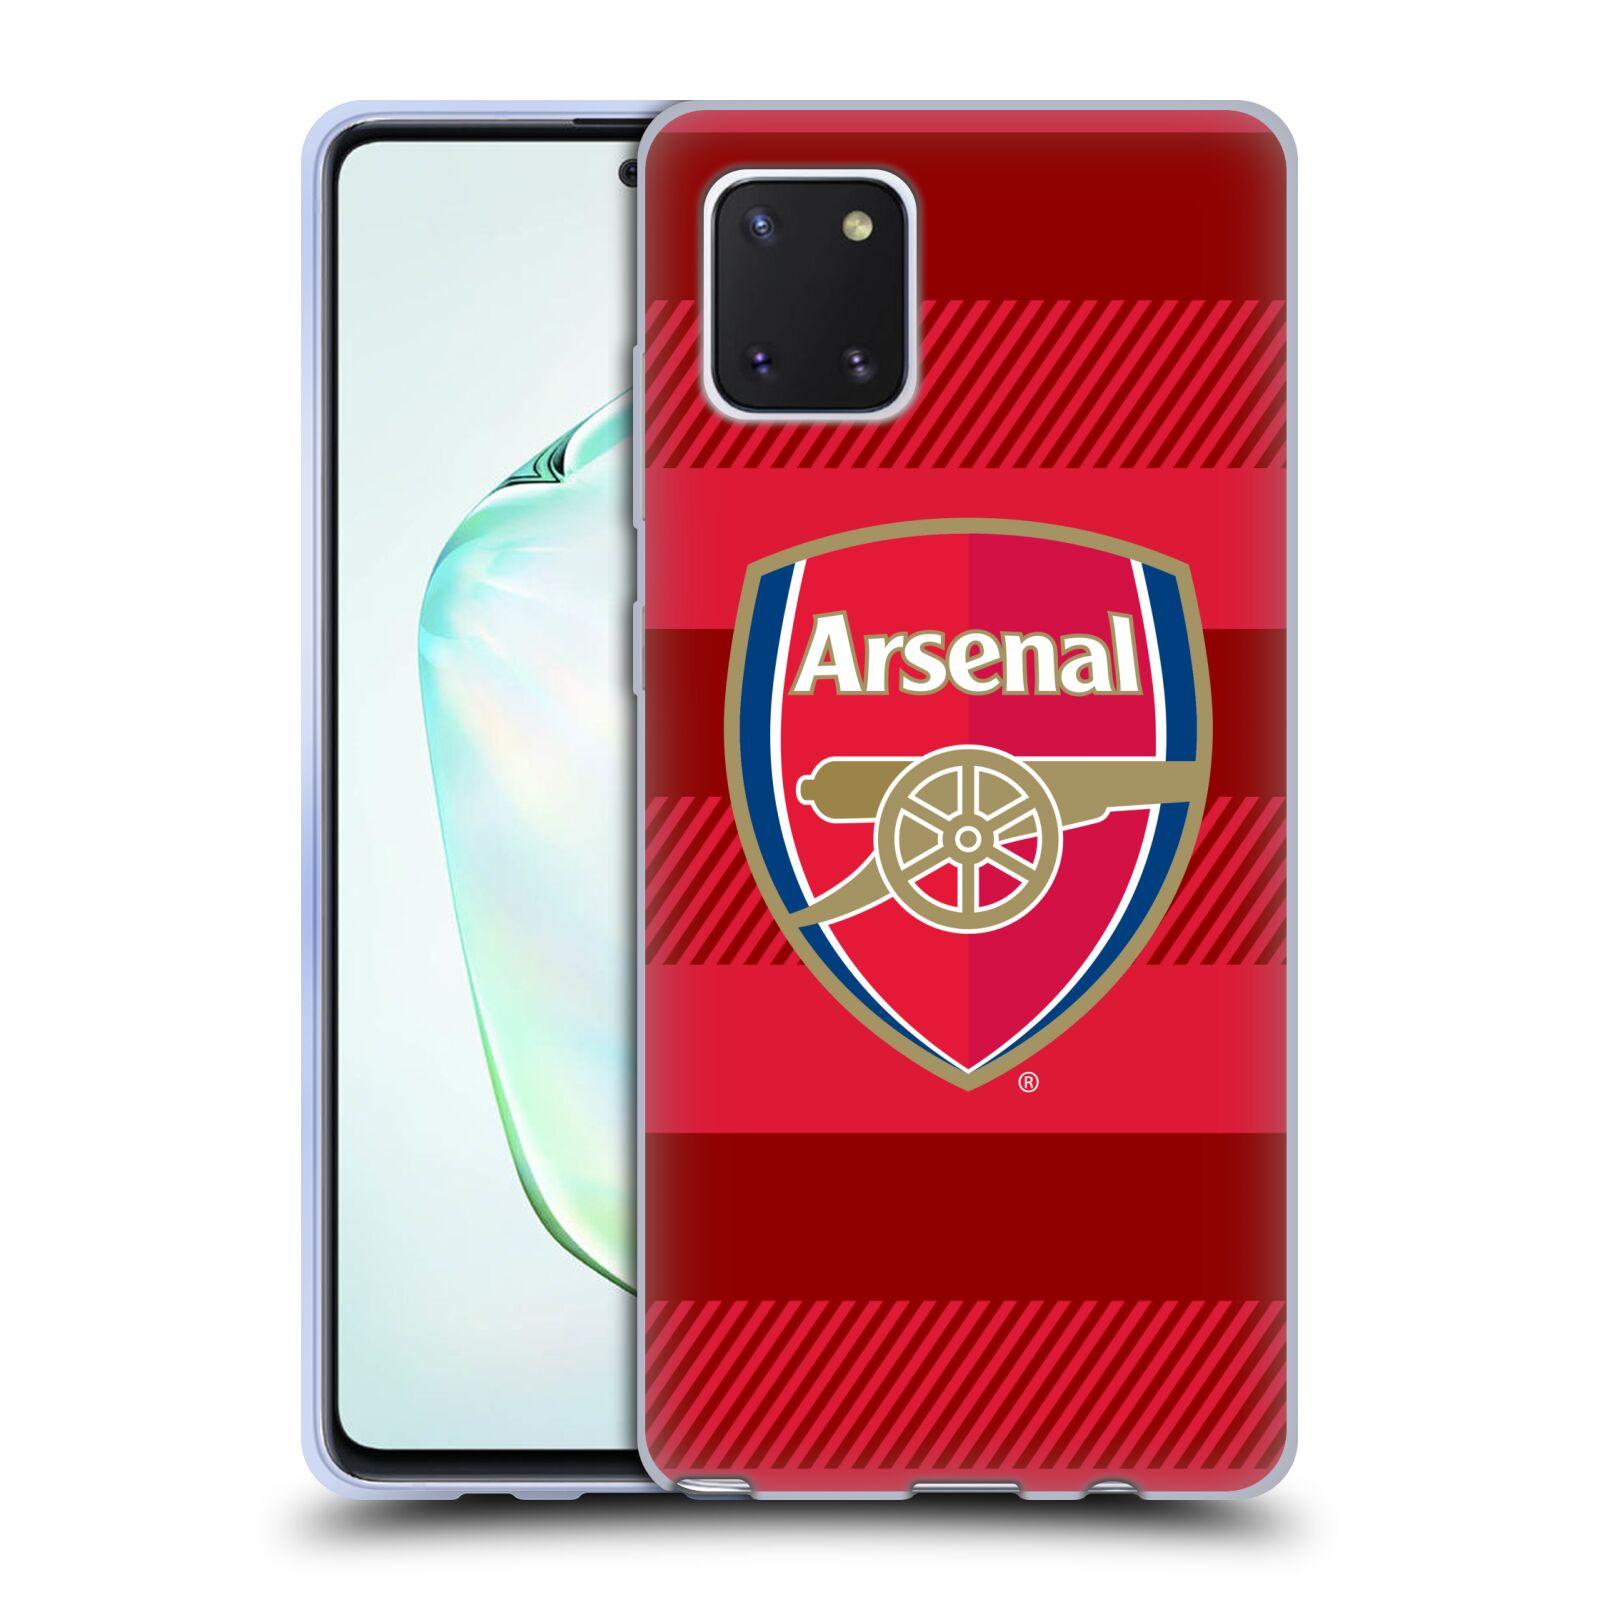 Silikonové pouzdro na mobil Samsung Galaxy Note 10 Lite - Head Case - Arsenal FC - Logo s pruhy